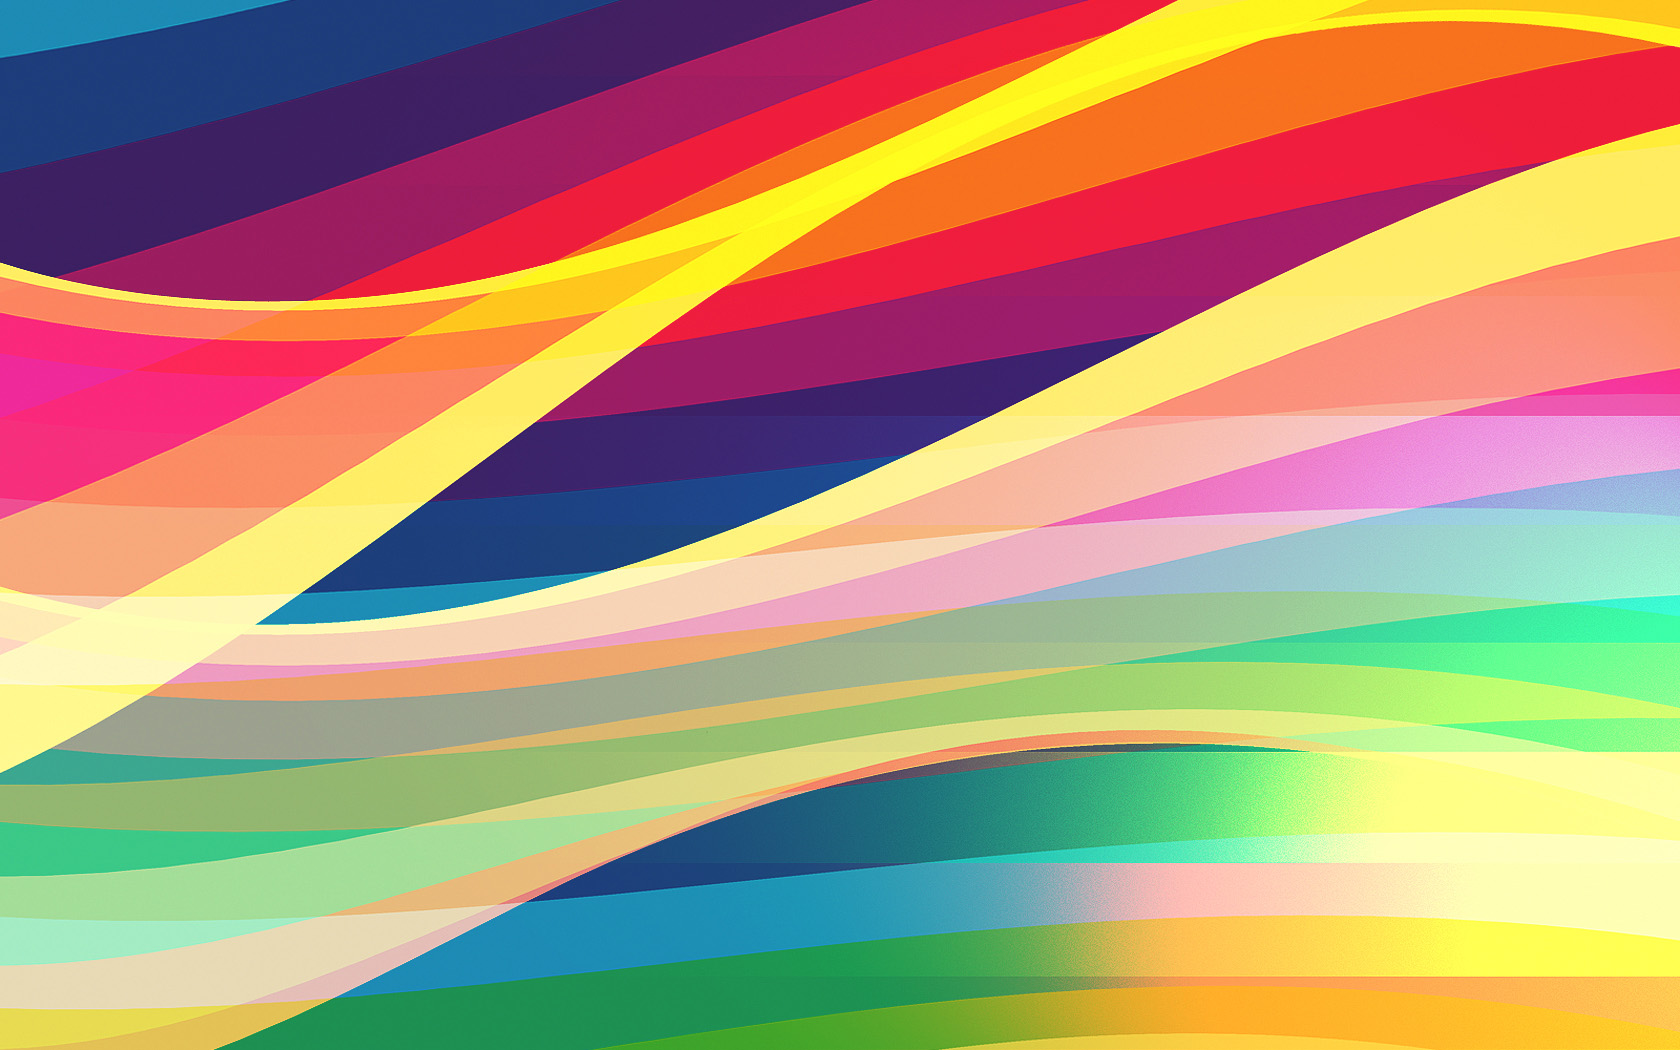 Colorful Backgrounds Free - WallpaperSafari